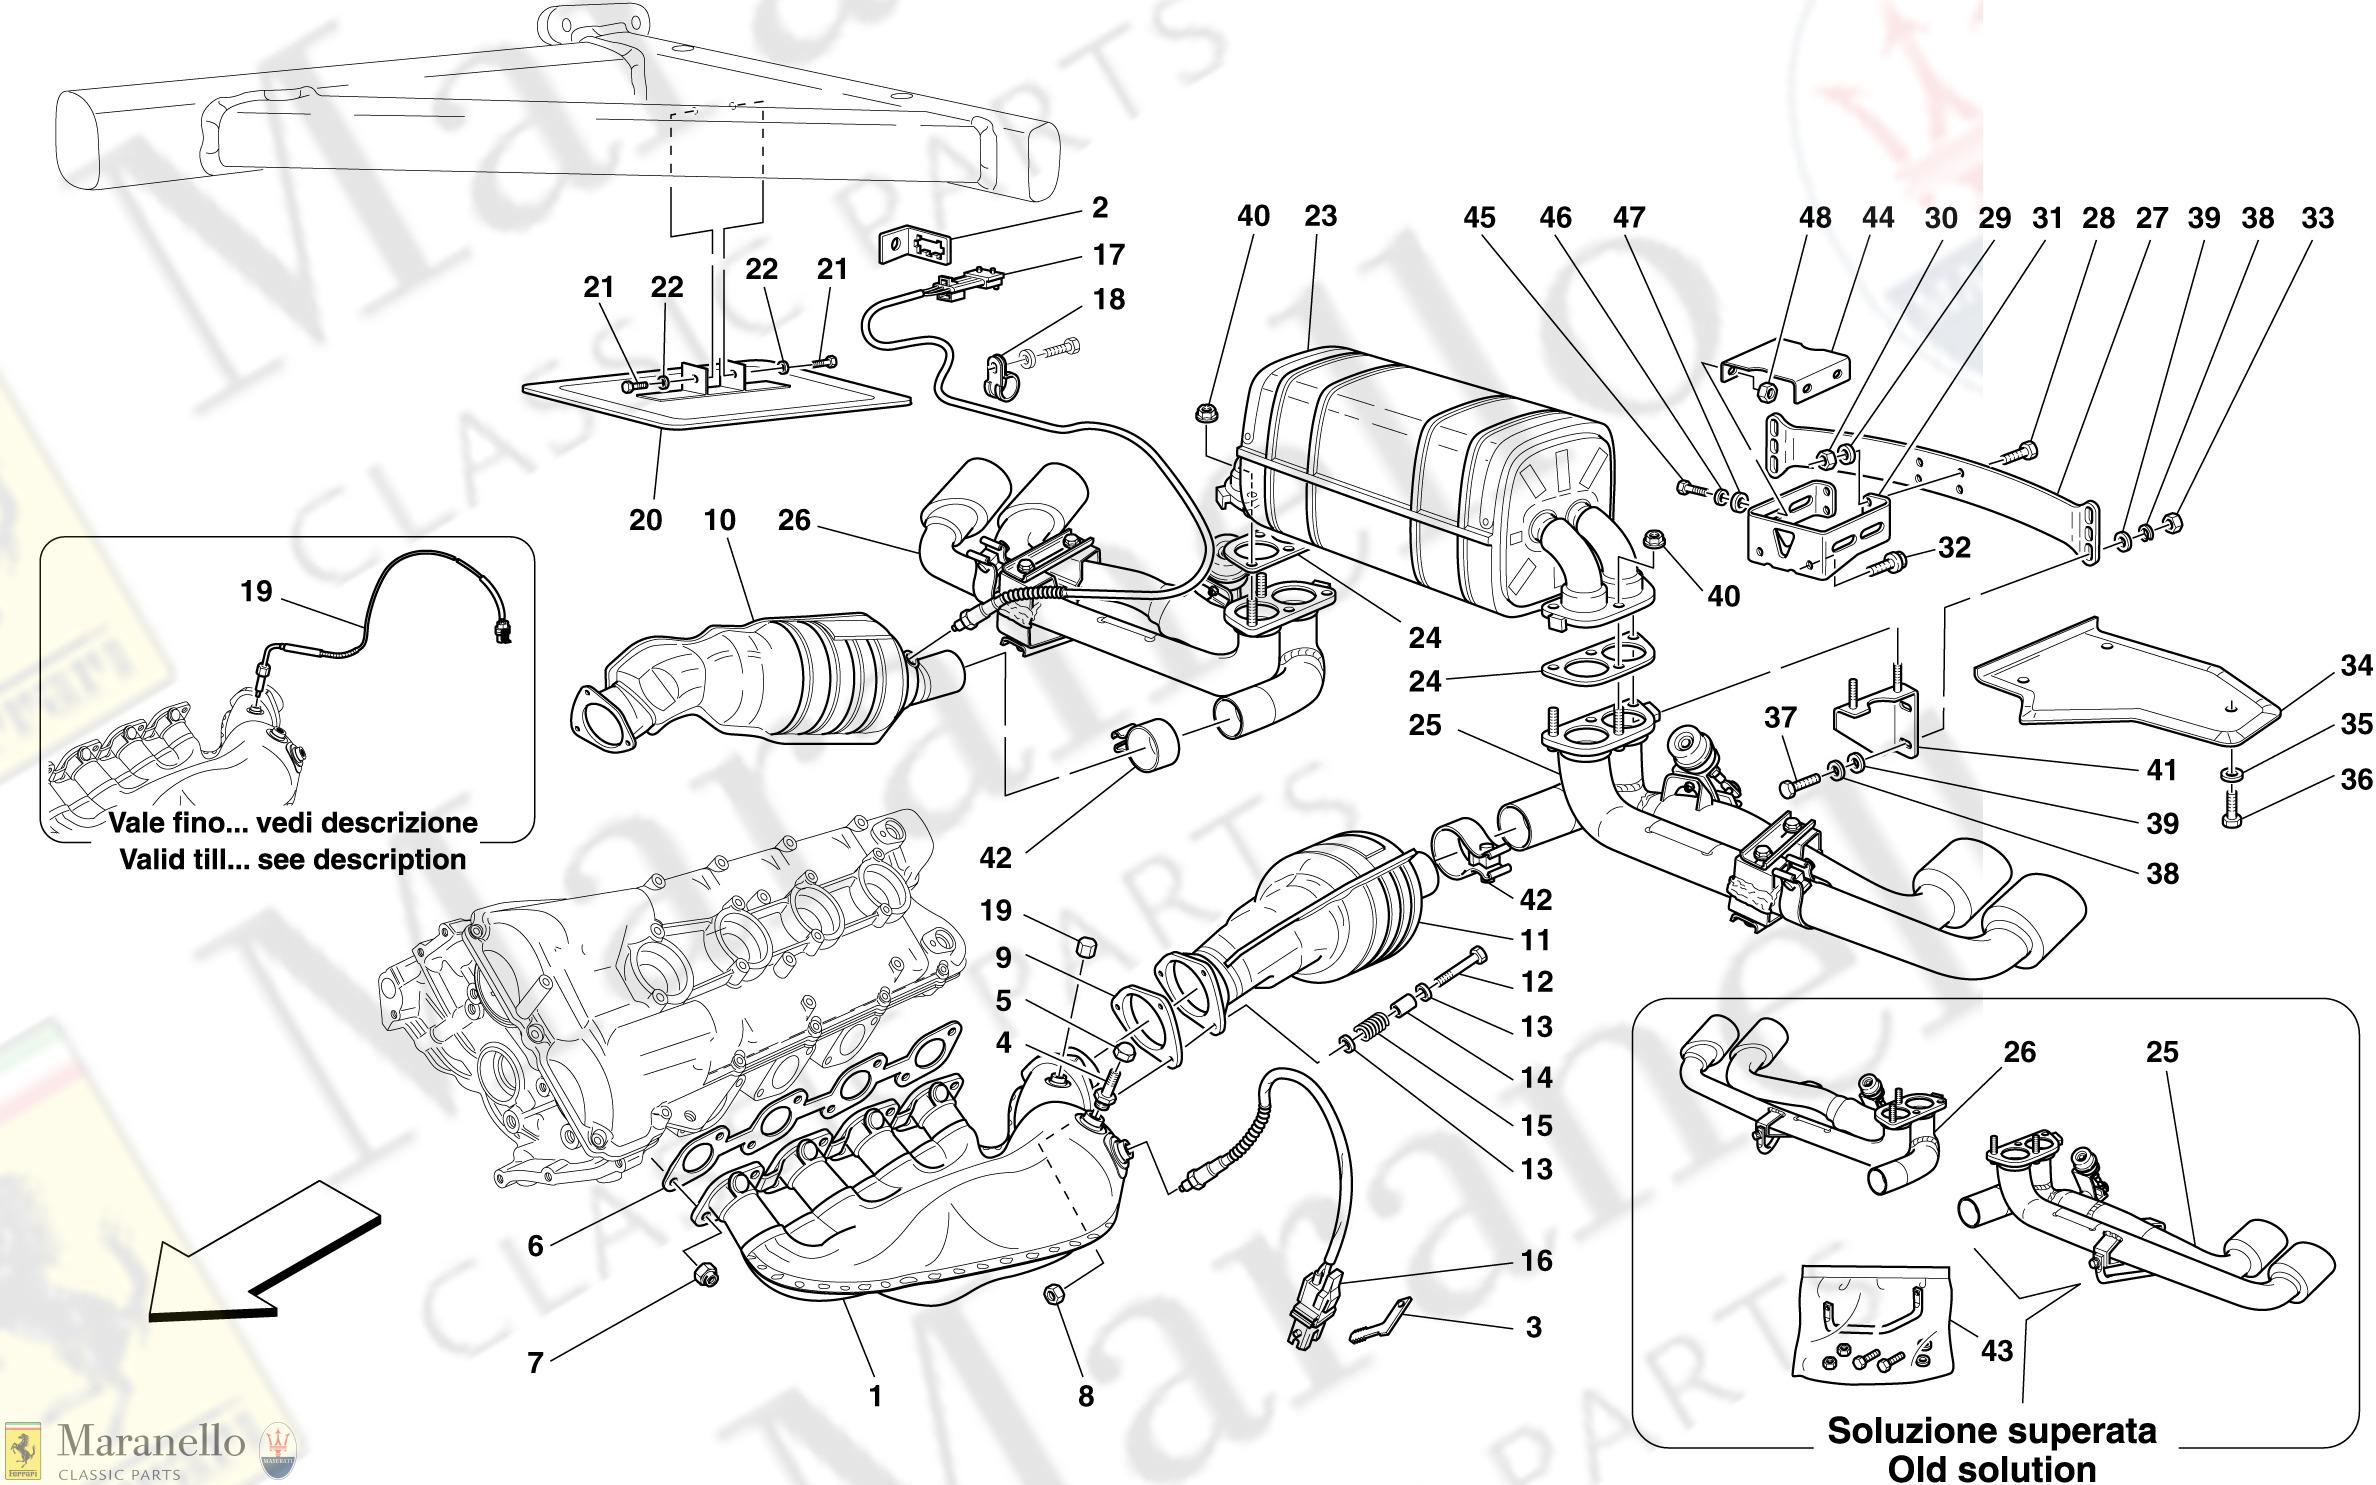 017 - Racing Exhaust System parts diagram for Ferrari F430 ... Ferrari F Spider Wiring Diagram on f355 spider, ferrari gto, ferrari california, ferrari f355, ferrari f12 berlinetta, ferrari testarossa, ferrari spyder, ferrari cars, ferrari roadster, ferrari scuderia, ferrari fxx, testarossa spider, ferrari f440, ferrari f40, ferrari 612 scaglietti,